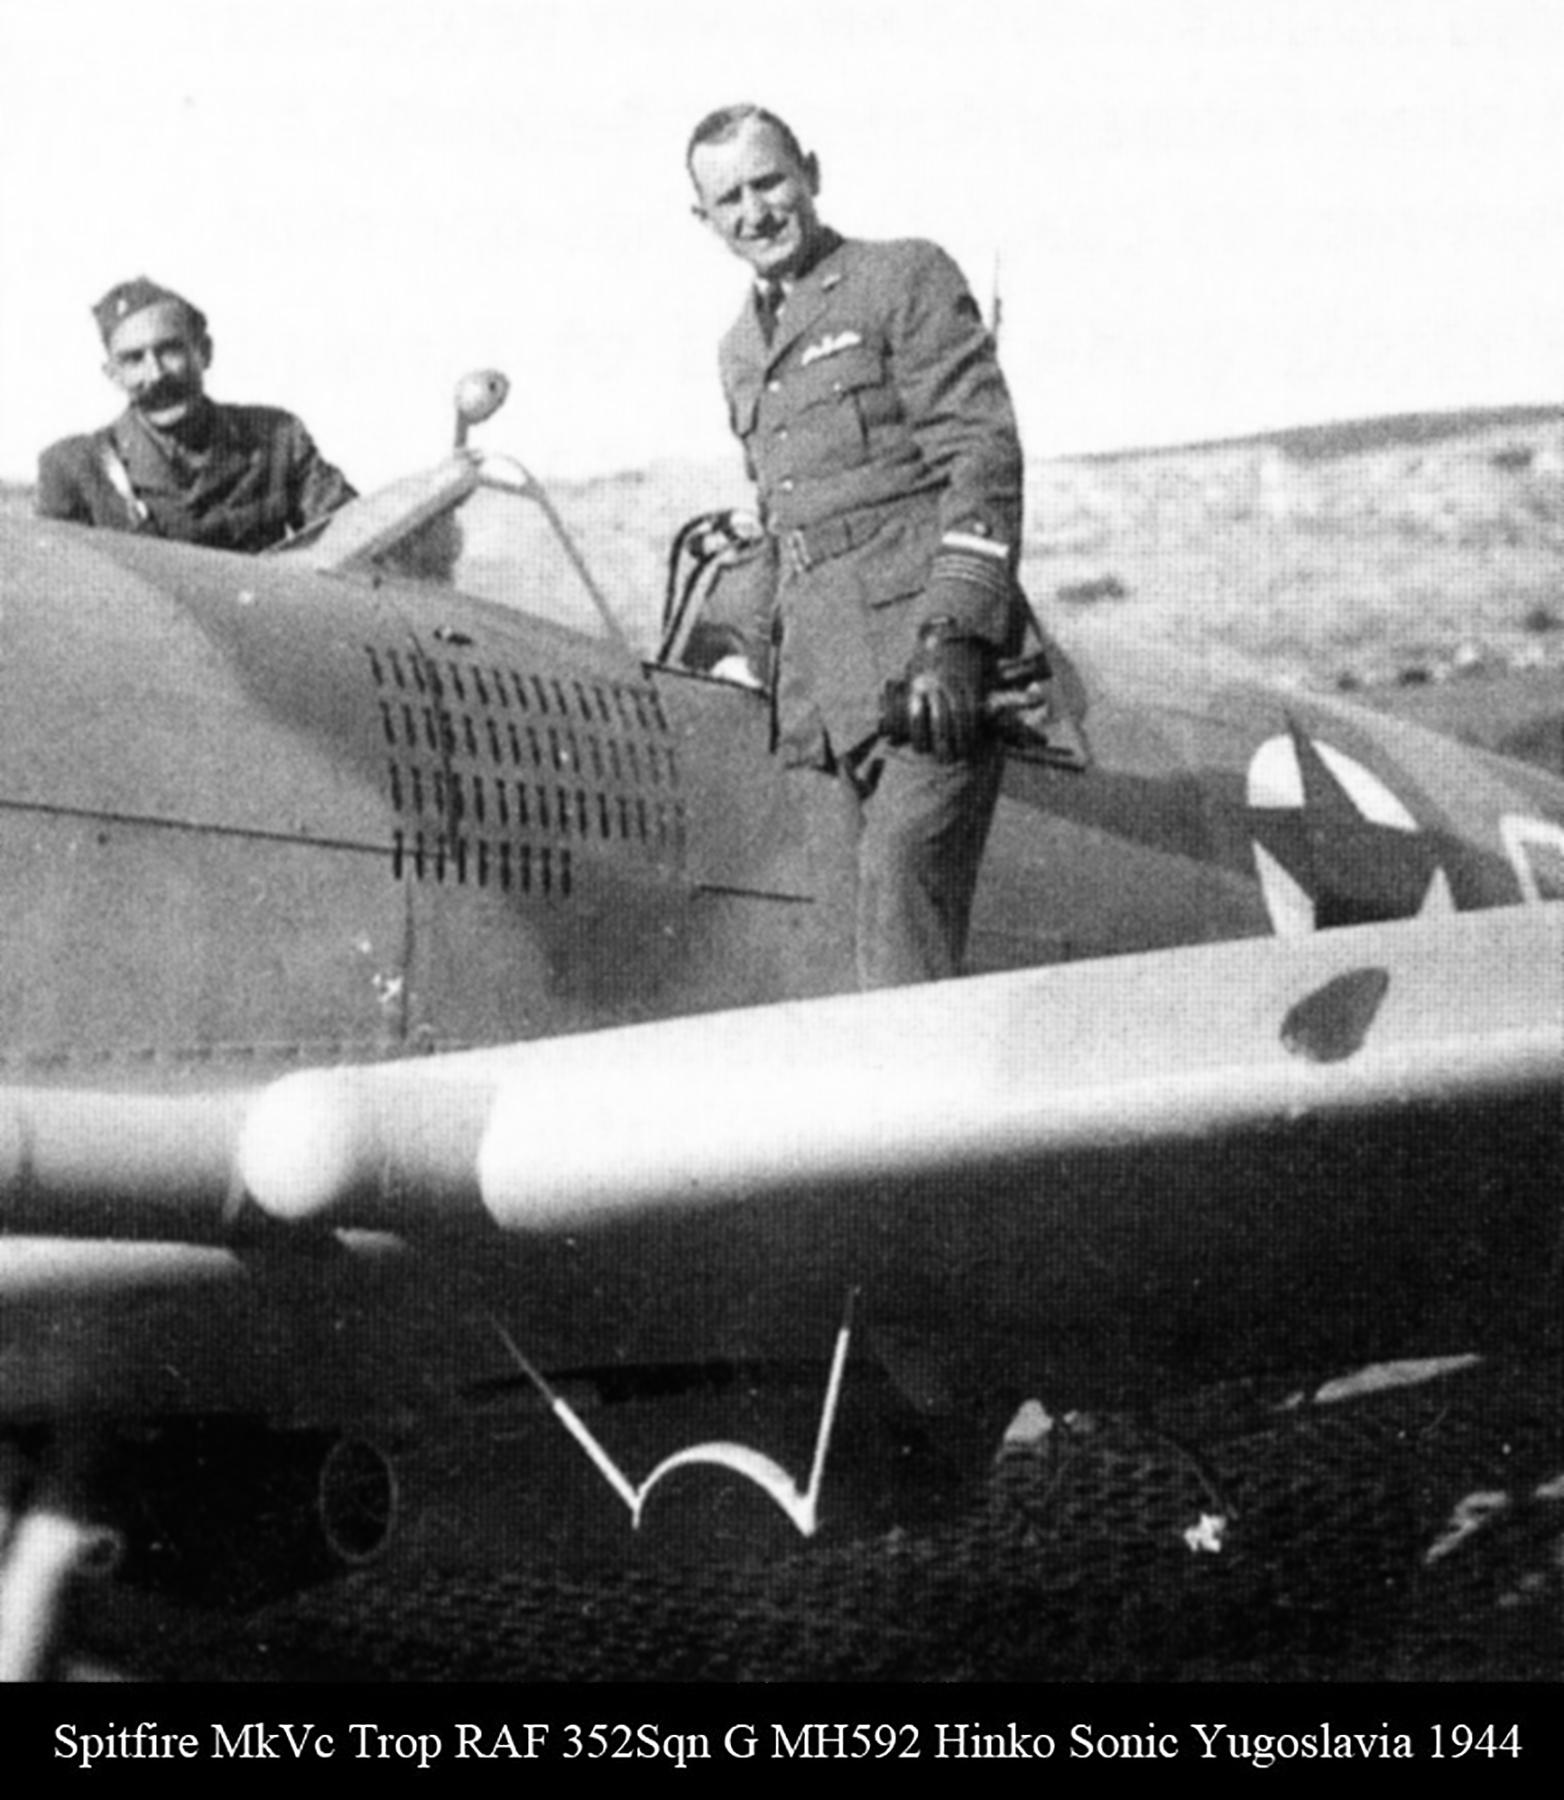 Spitfire MkVcTrop RAF 352Sqn G MH592 Hinko Sonic Yugoslavia 1944 01